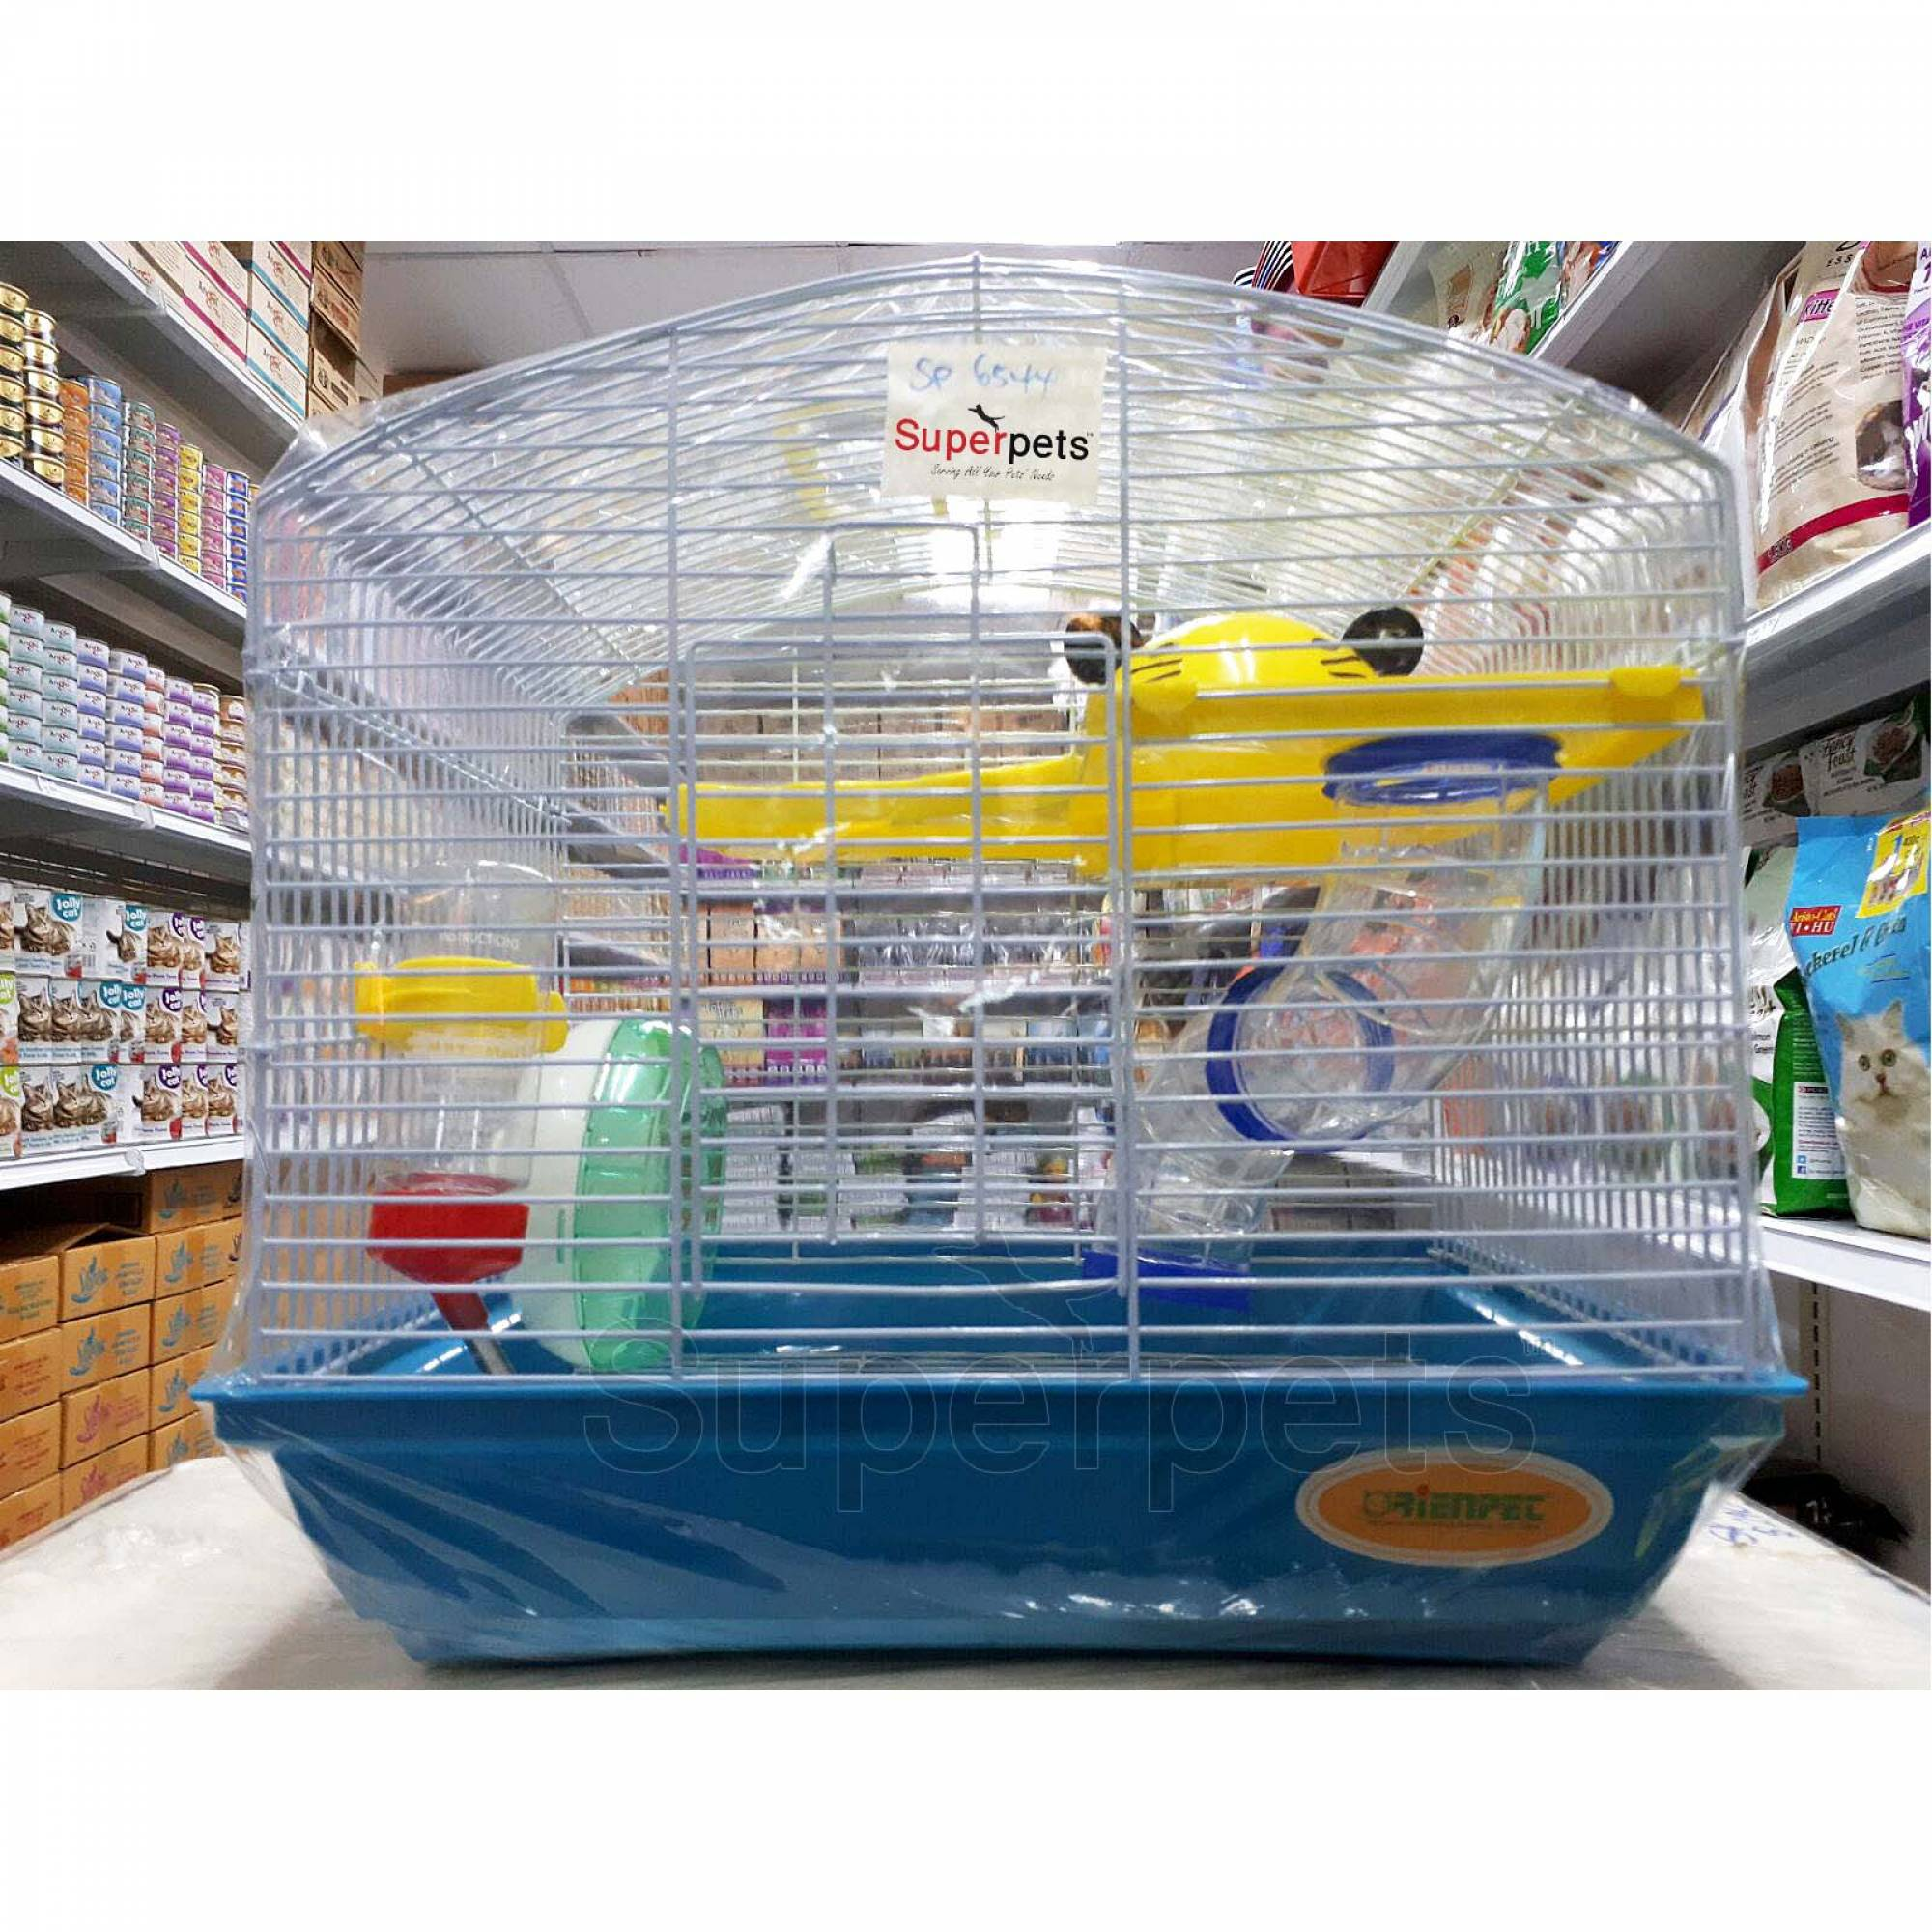 OPSP6544 Hamster Cage - Blue / Pink / Purple - Blue